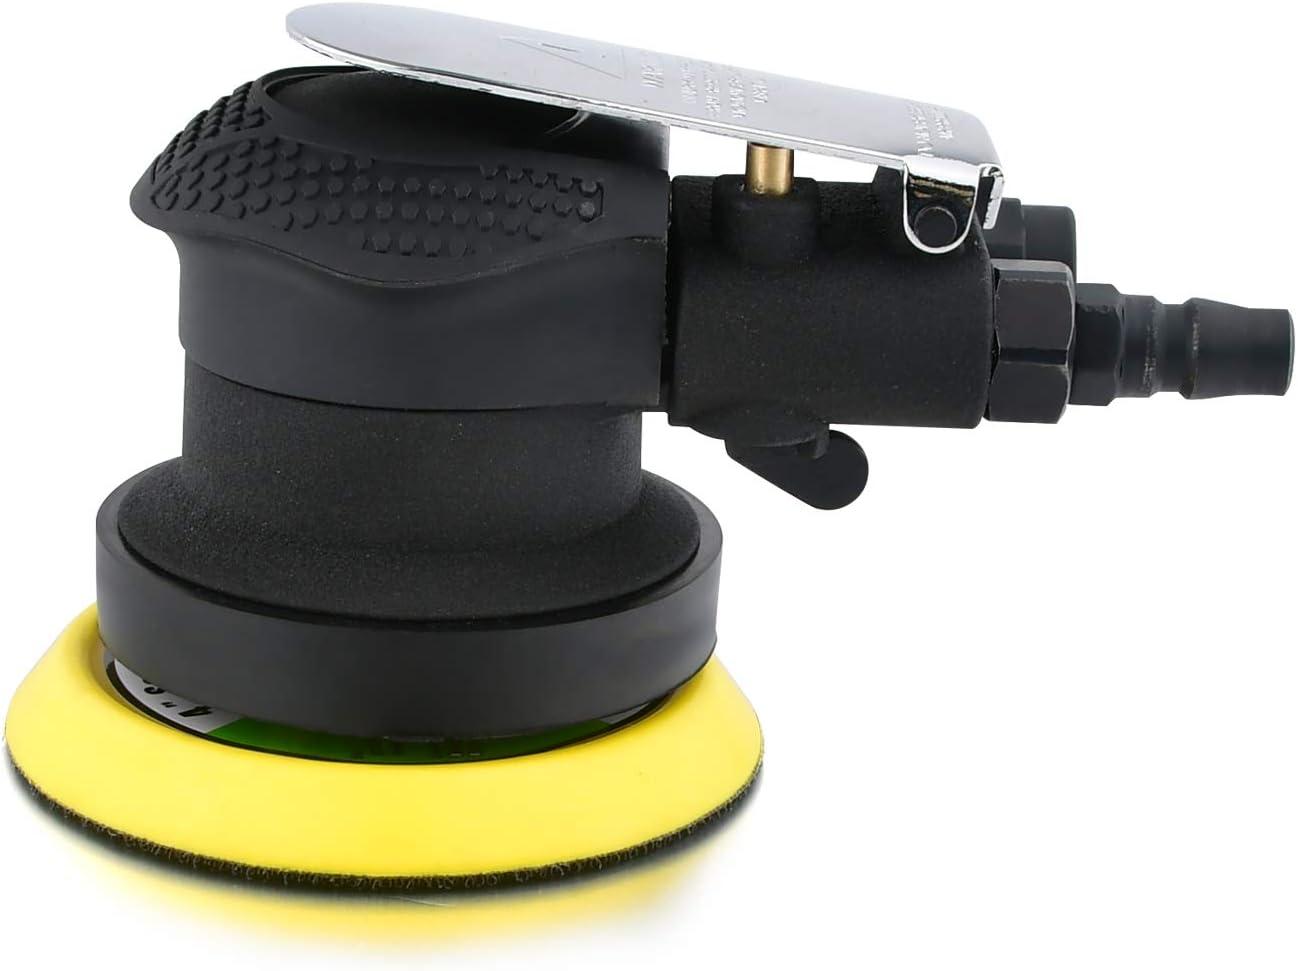 SHININGEYES Air Sander 4 Air Random Orbital Sander Round Polisher Pneumatic Hand Sanding Tool for Auto body Automotive